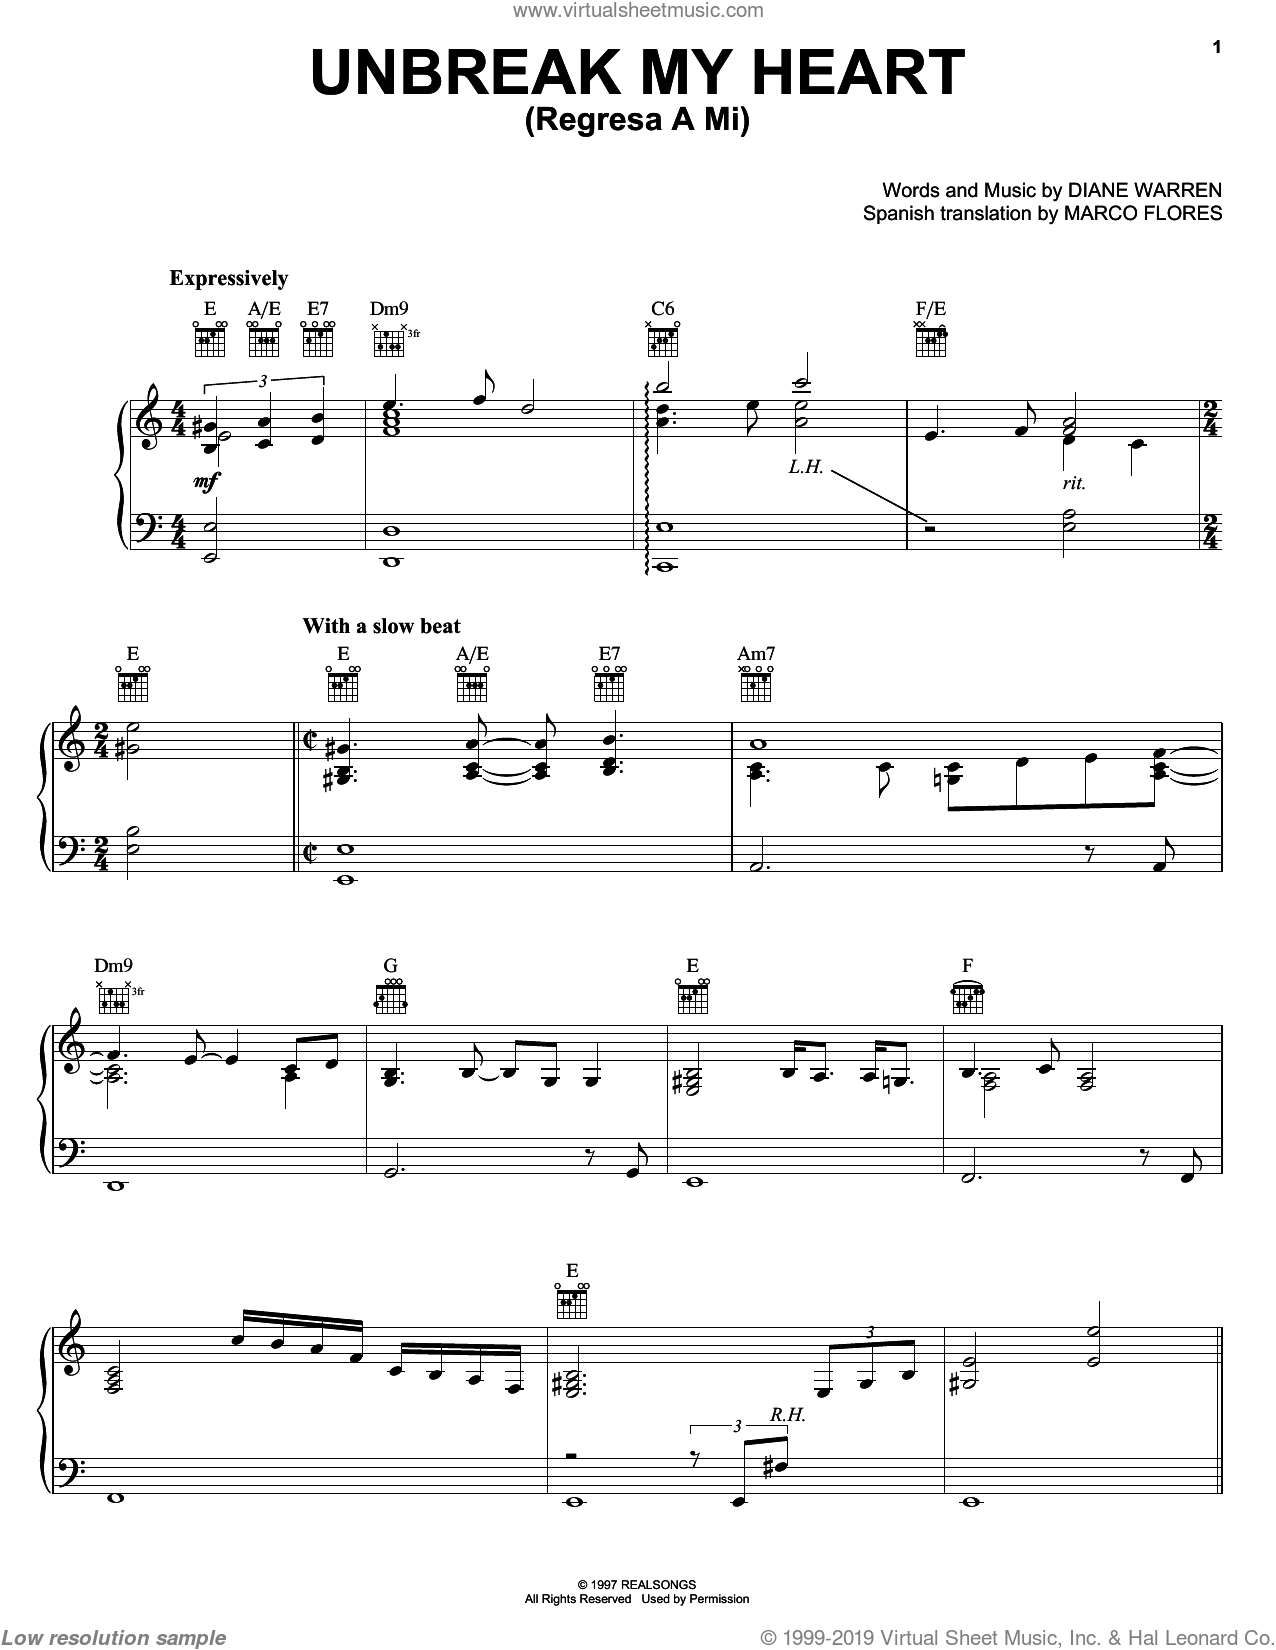 Un-break My Heart sheet music for voice, piano or guitar by Diane Warren and Il Divo, intermediate skill level